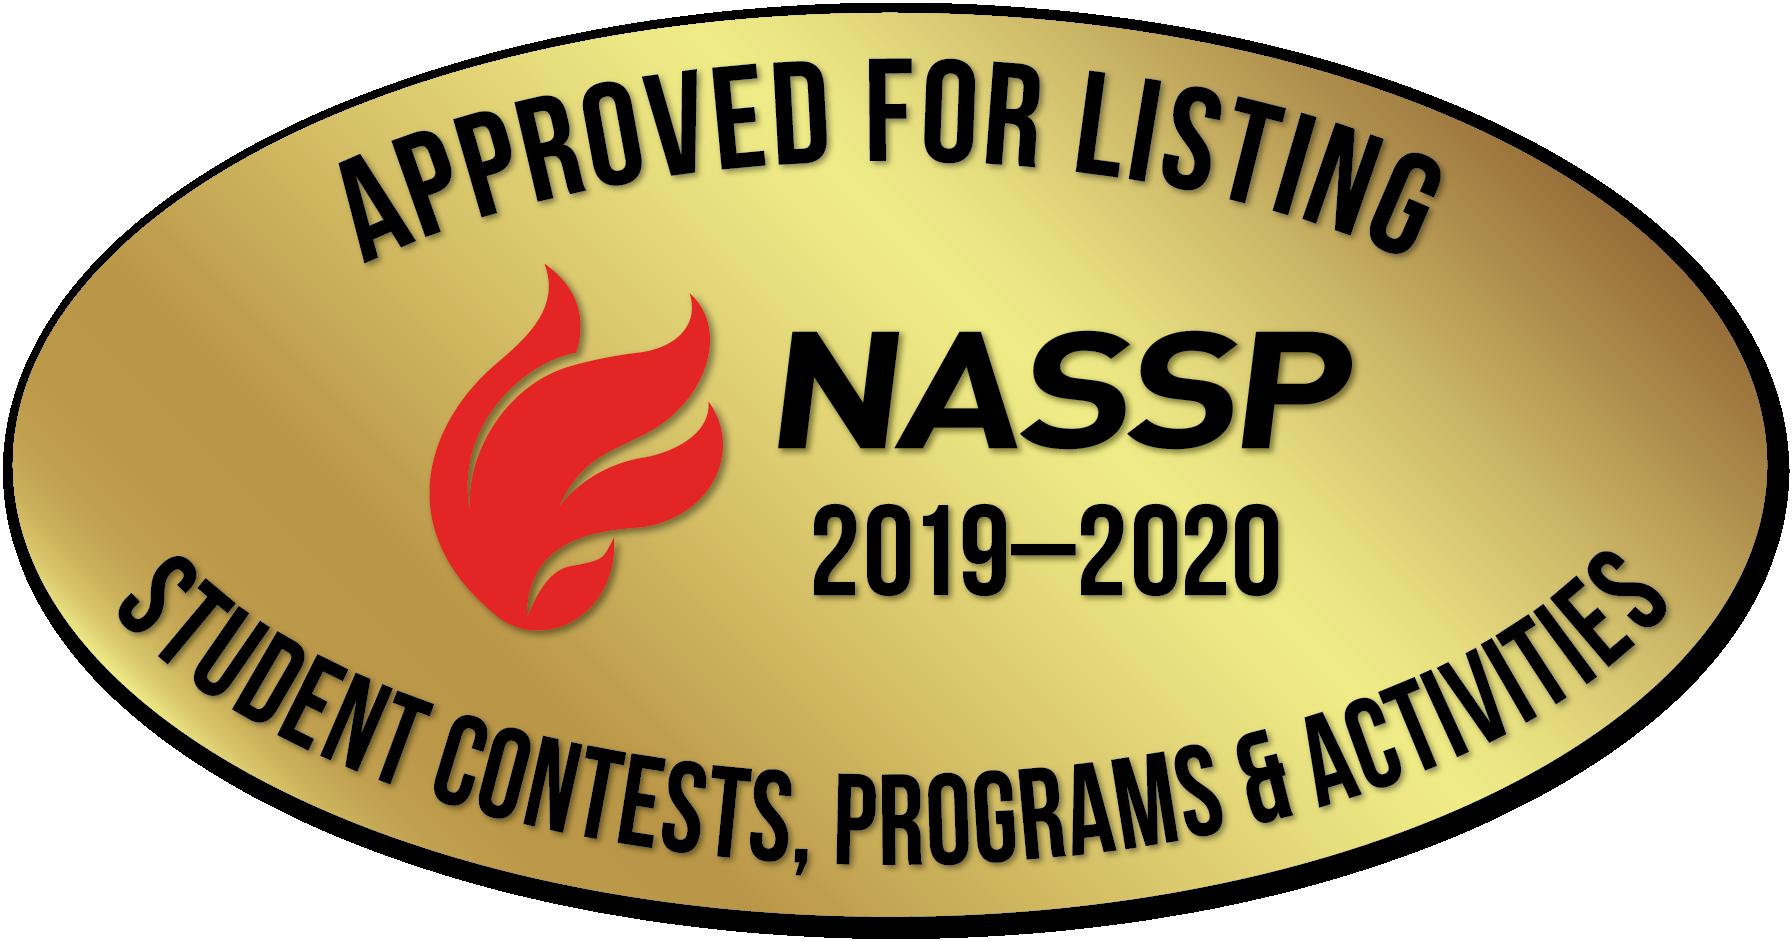 ApprovedActivitiesSeal_2019-2020